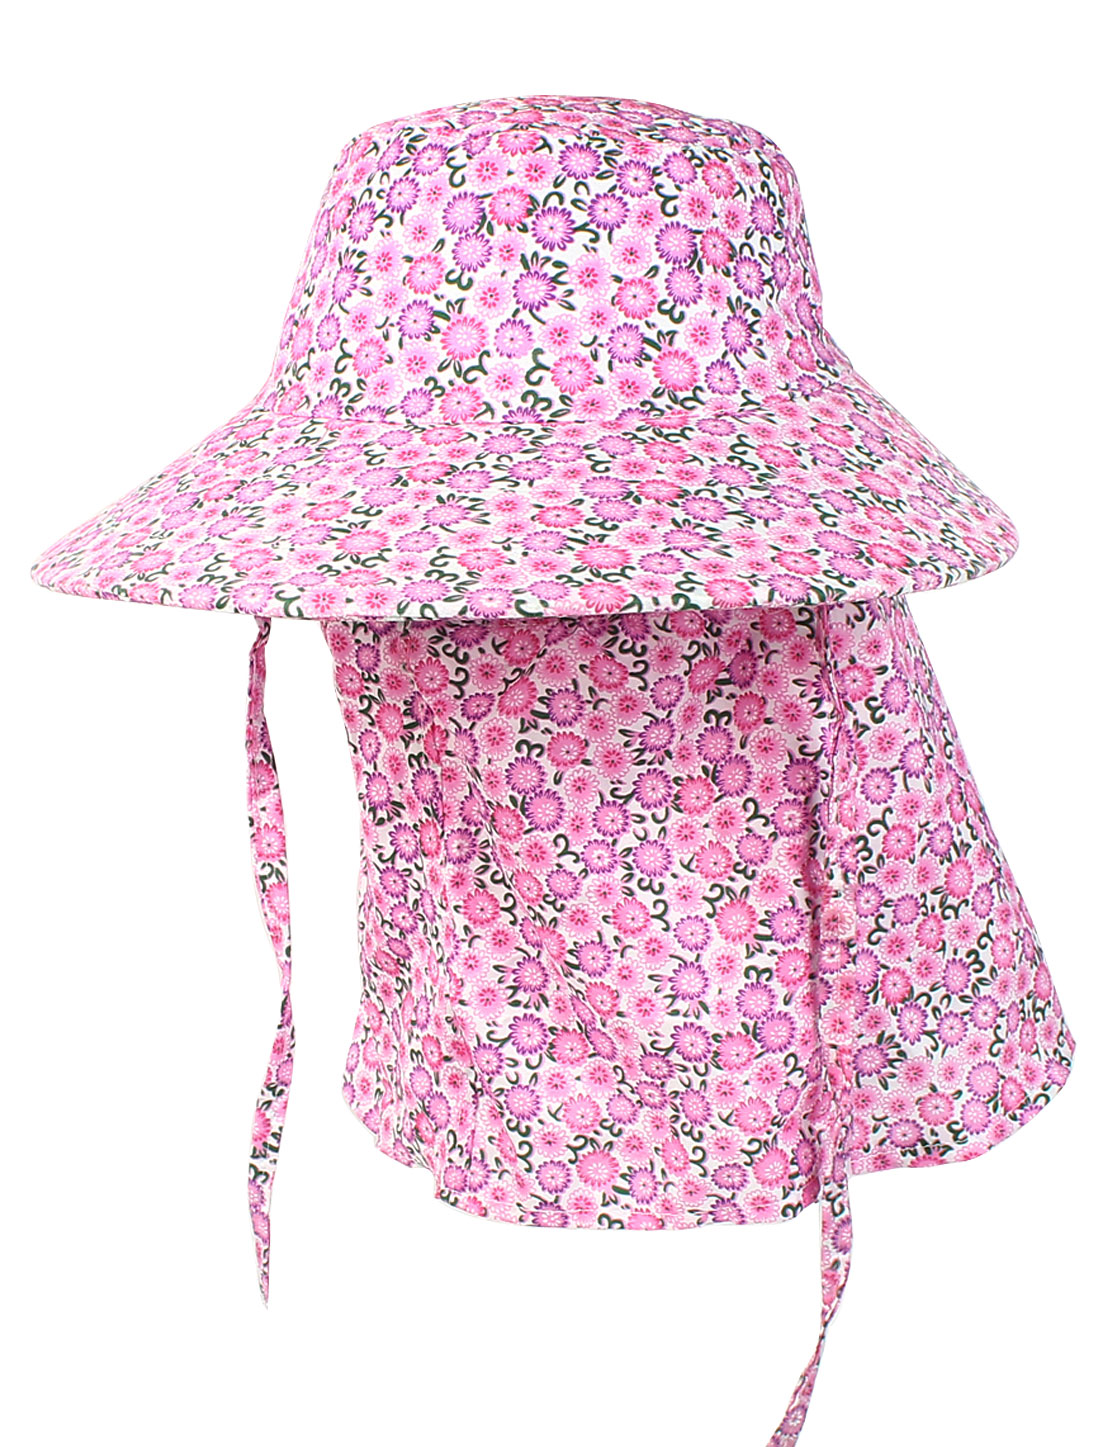 Ladies Outdoor Neck Strap Flower Print Bucket Style Hat Cap Pink